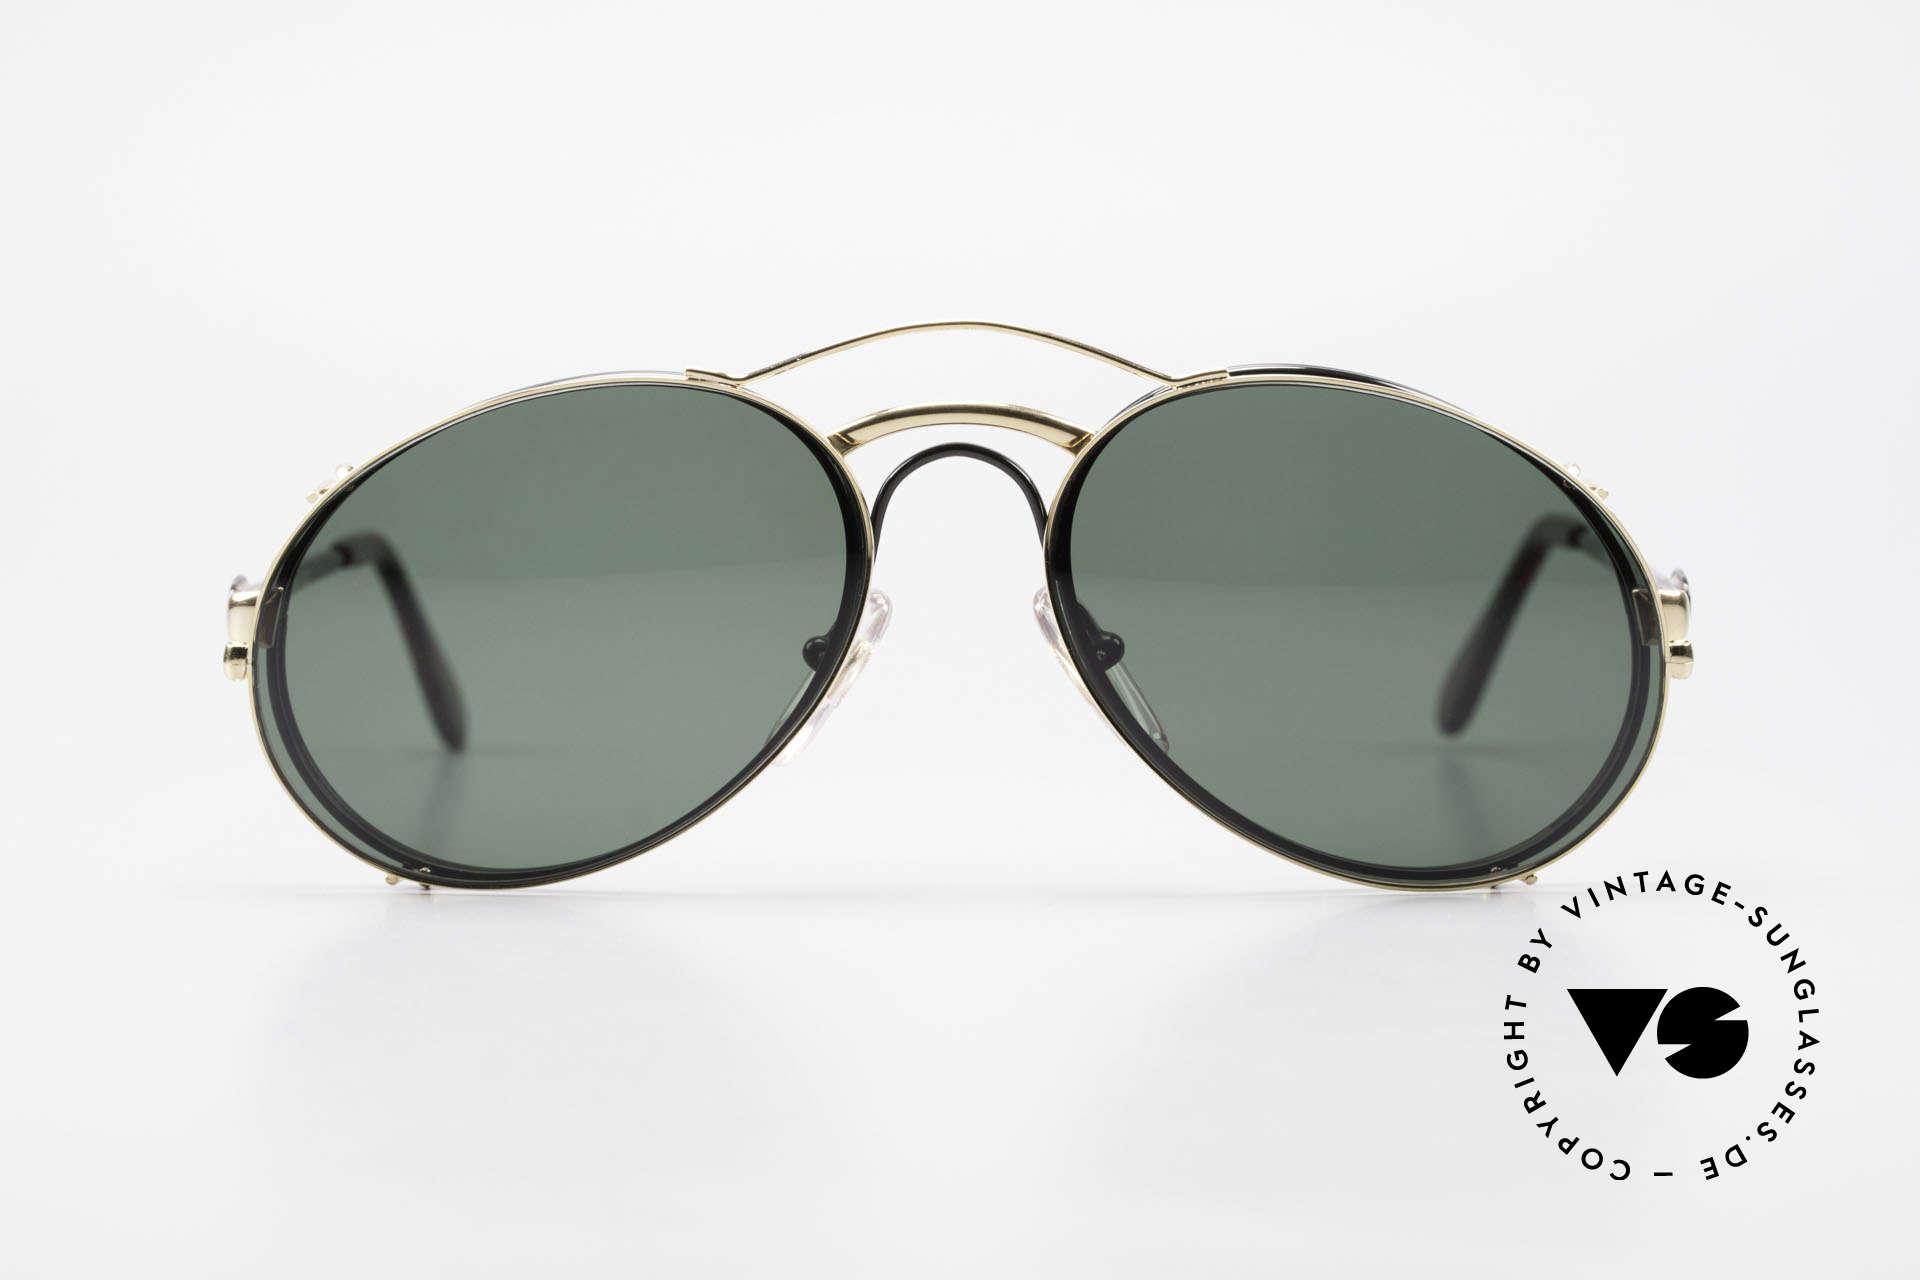 Bugatti 03327 Men's 80's Eyeglasses Clip On, distinctive Bugatti 'tear drop' shape; in 50mm size, Made for Men